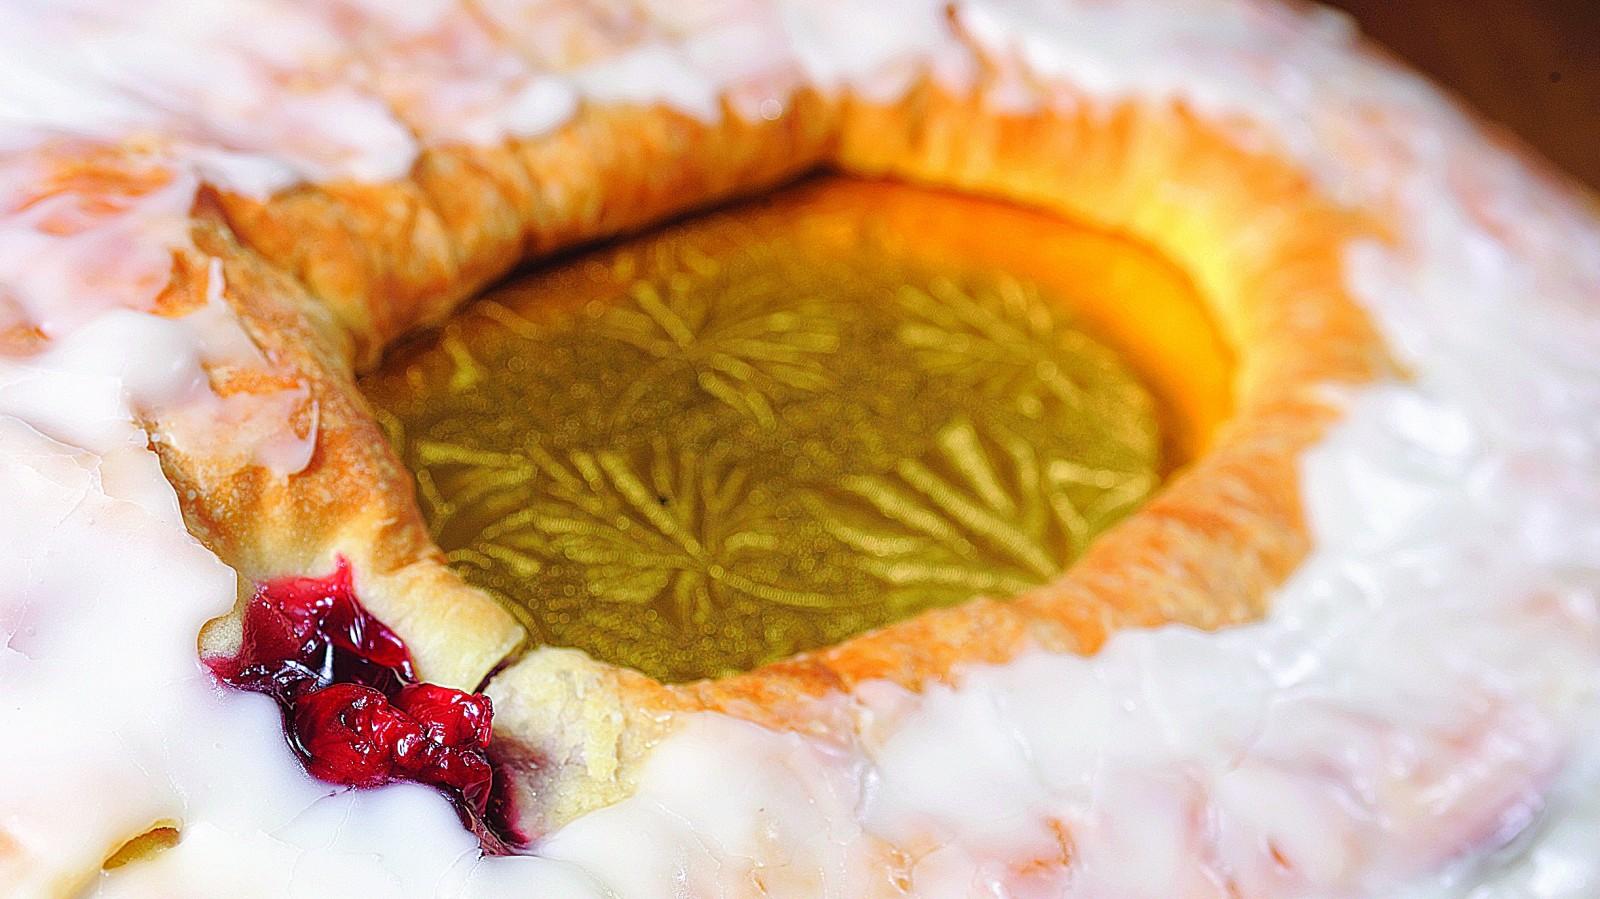 A cherry filled Kringle from Ohlson's Bakery. (Photo by Michael Majewski)